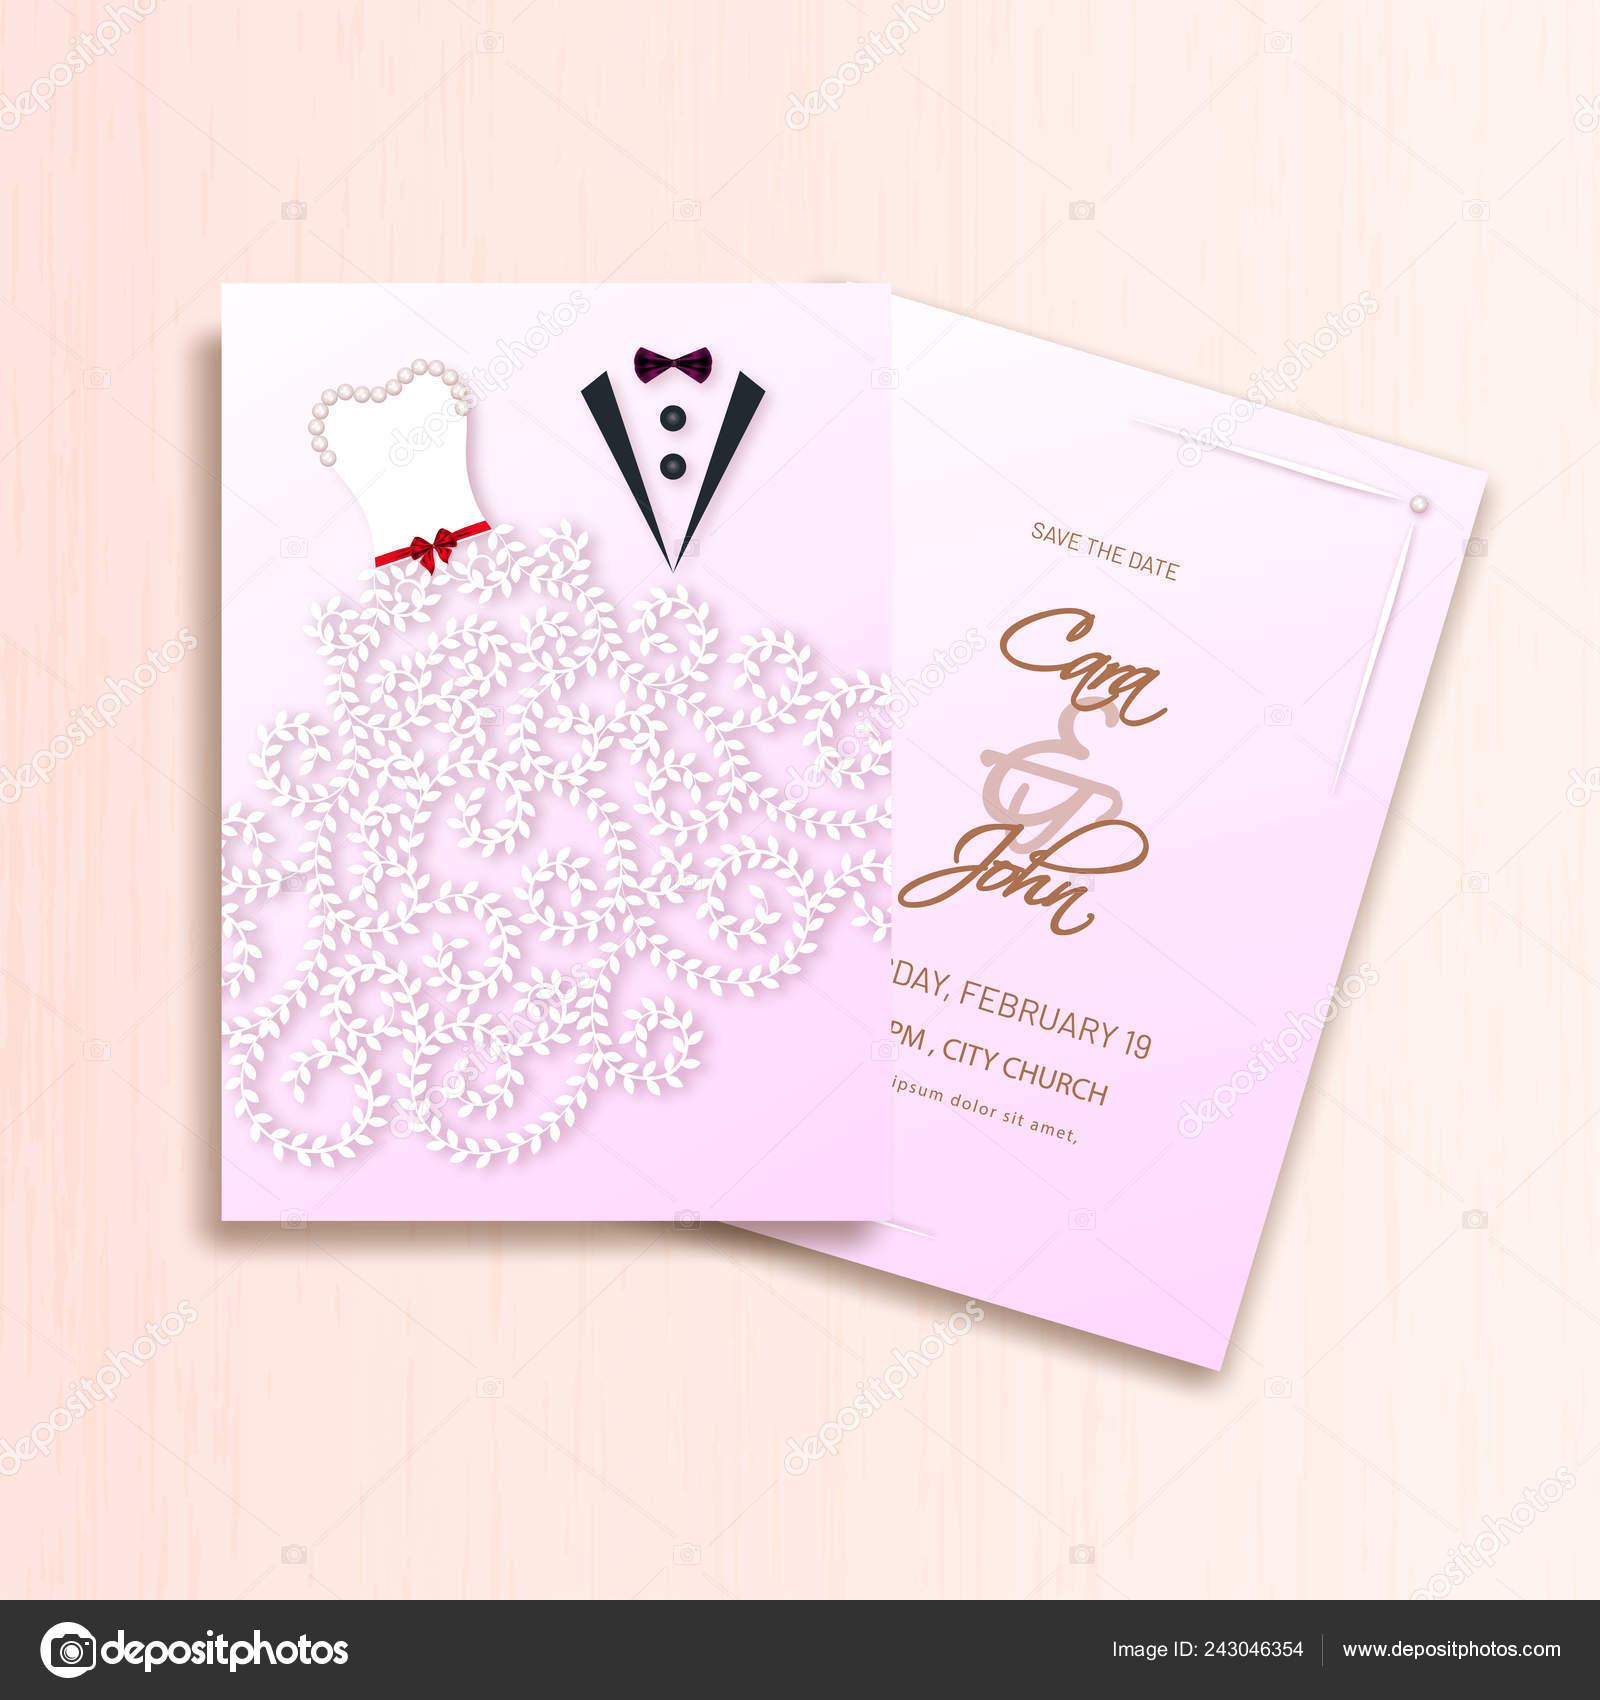 Creative Wedding Invitation Card Template Design Groom Bride